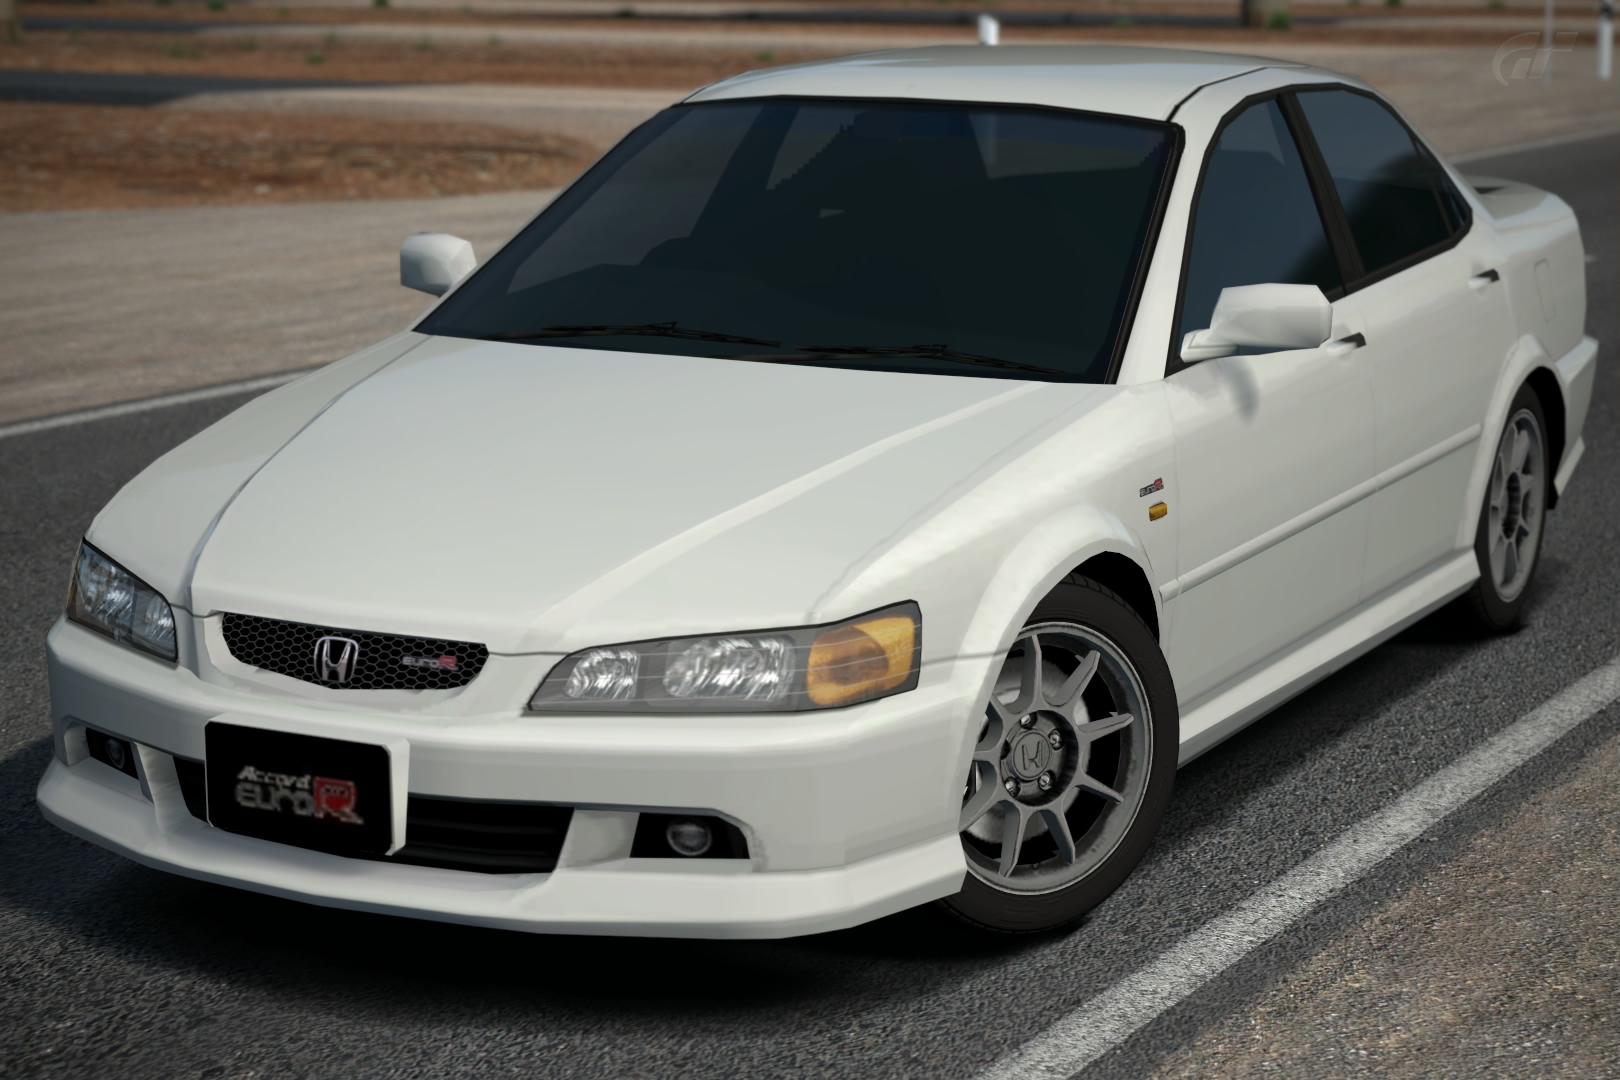 Latest Cb on 2000 Honda Accord